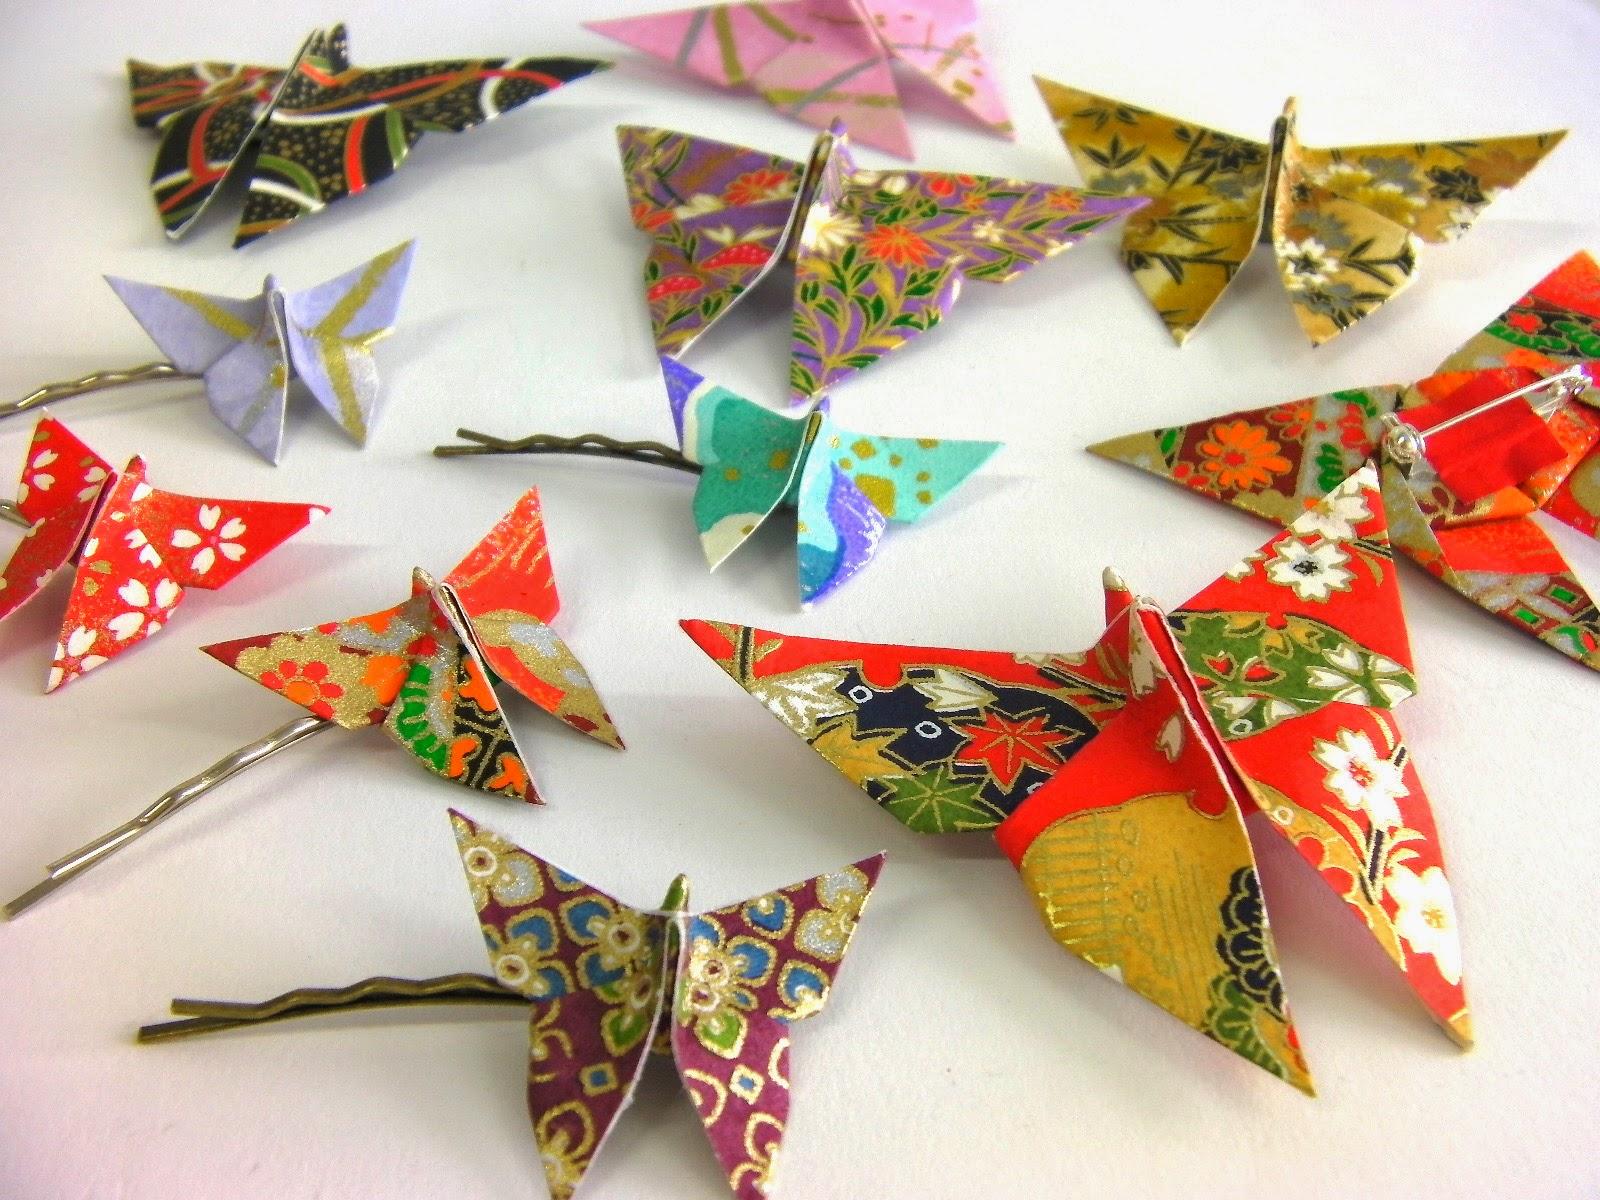 origami bijoux japonais. Black Bedroom Furniture Sets. Home Design Ideas